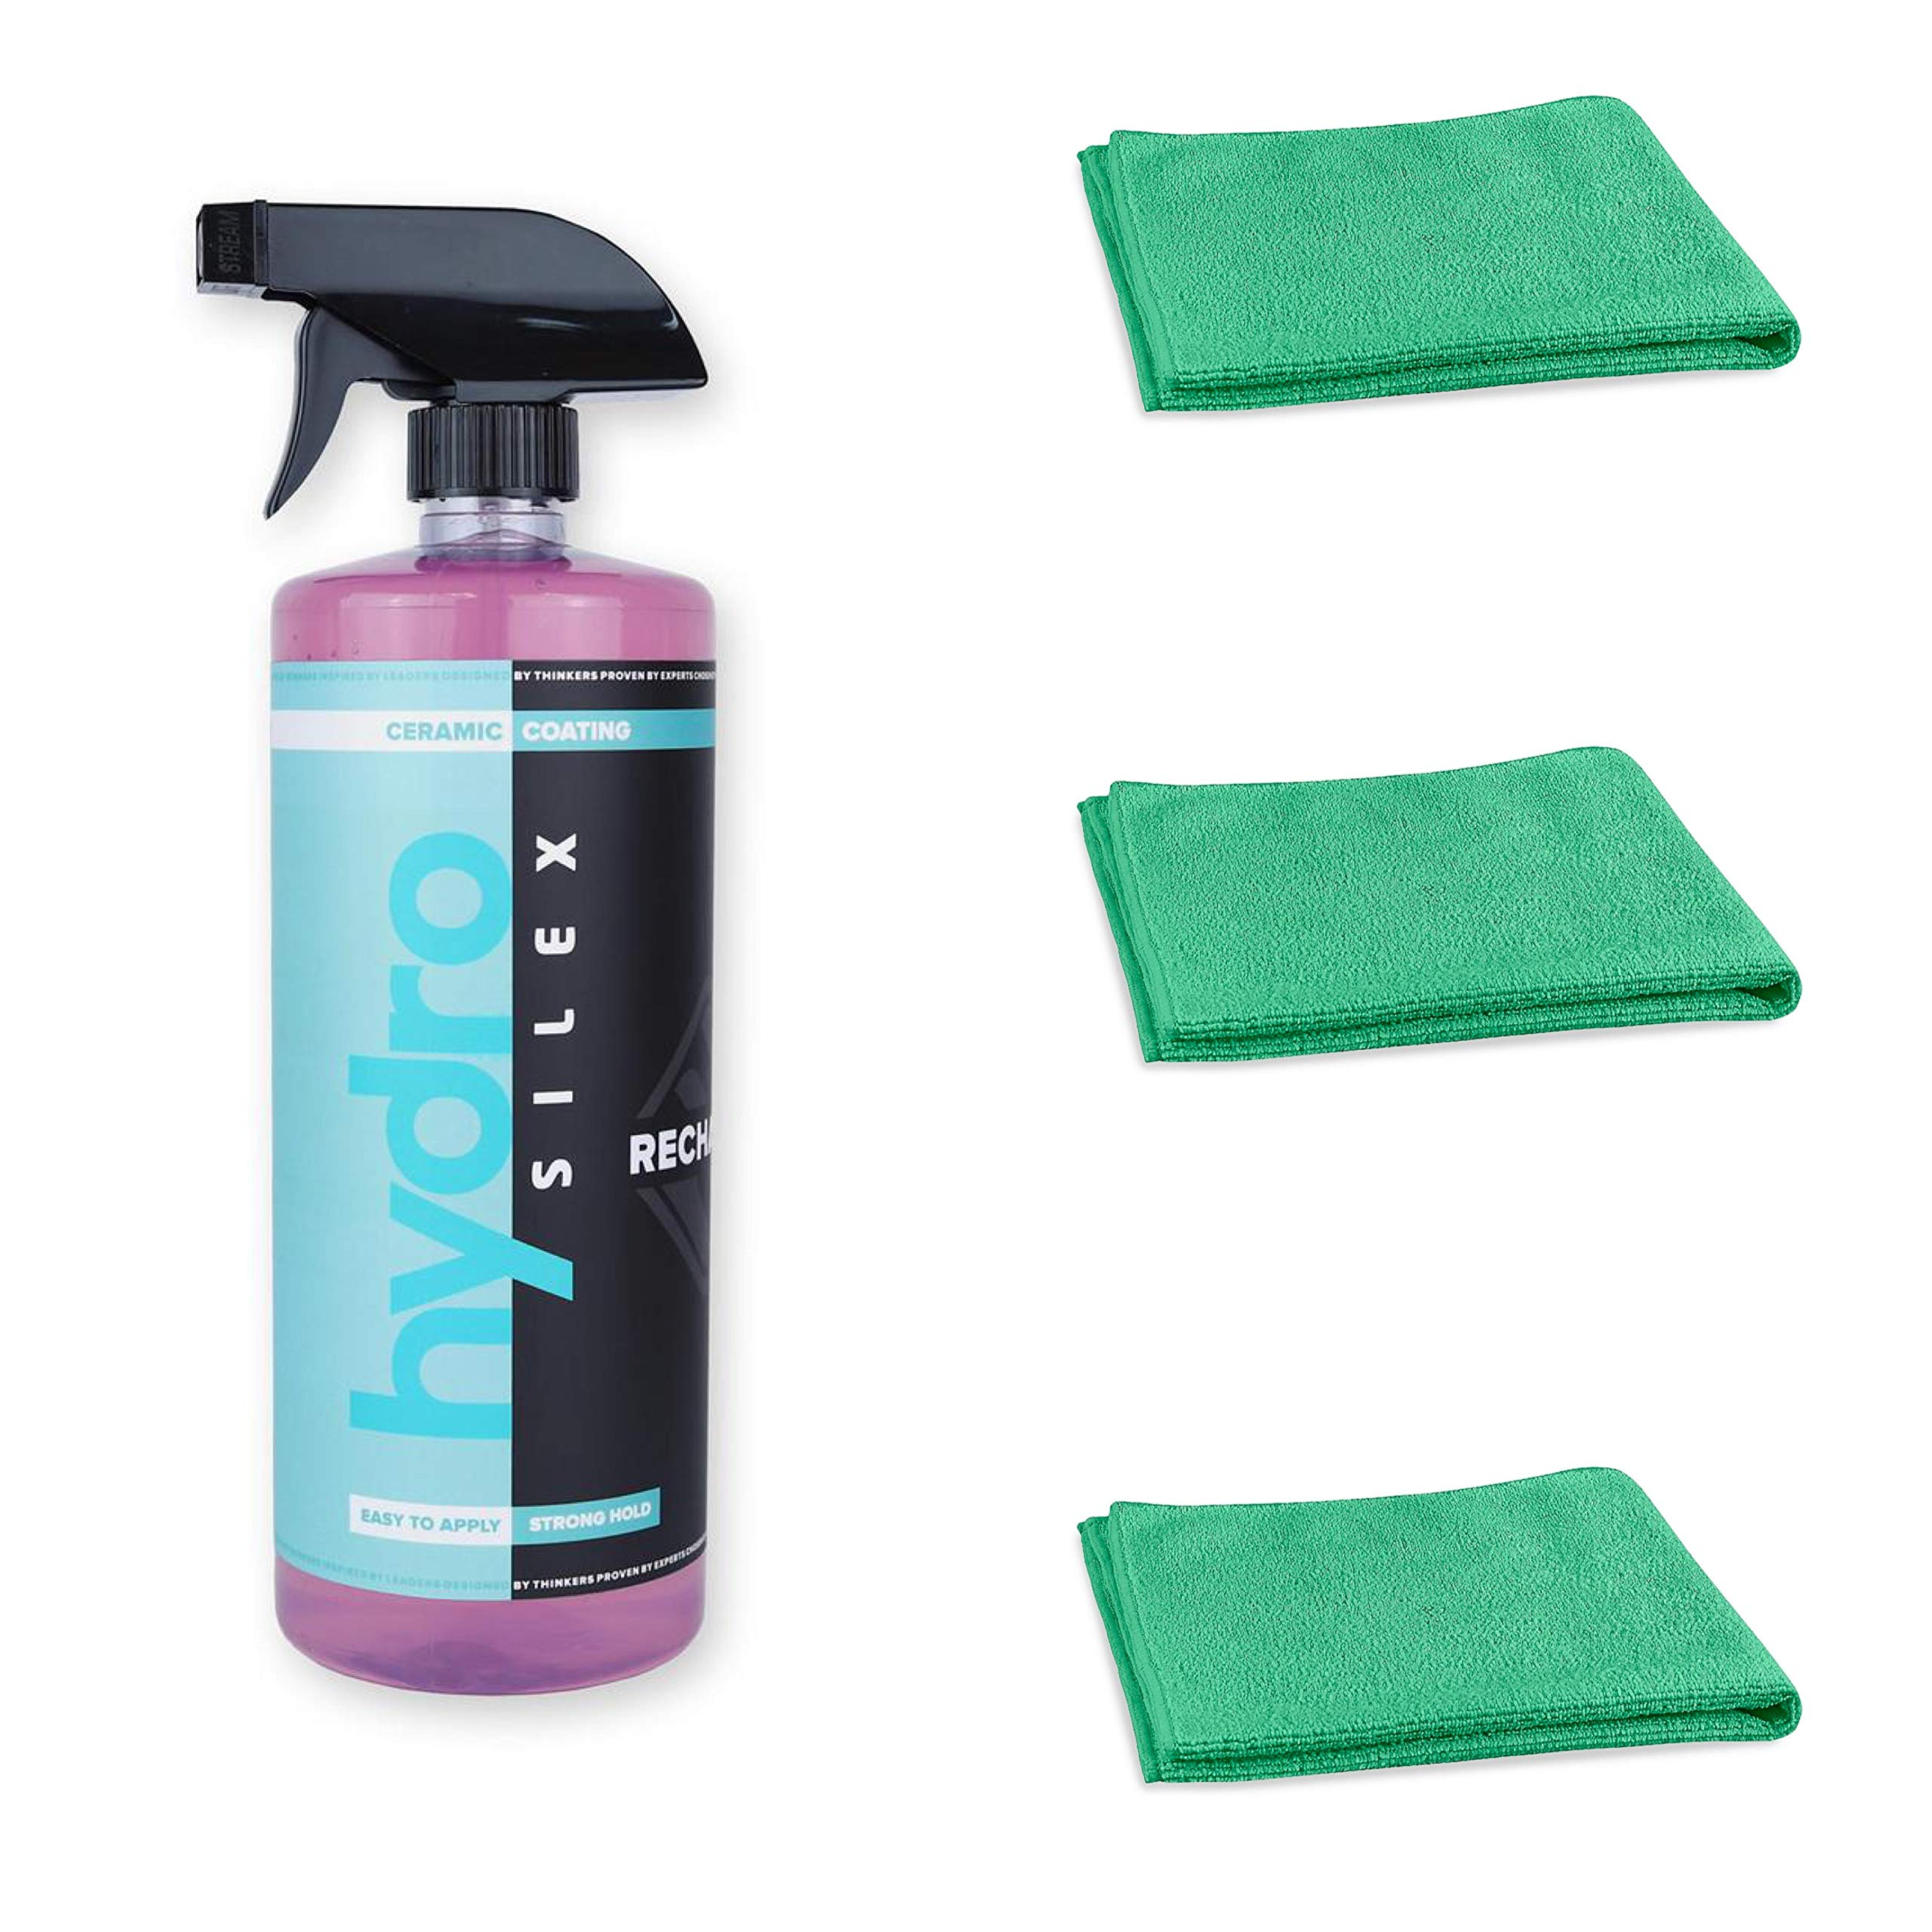 HydroSilex Recharge 32oz & 3 Microfiber Towels